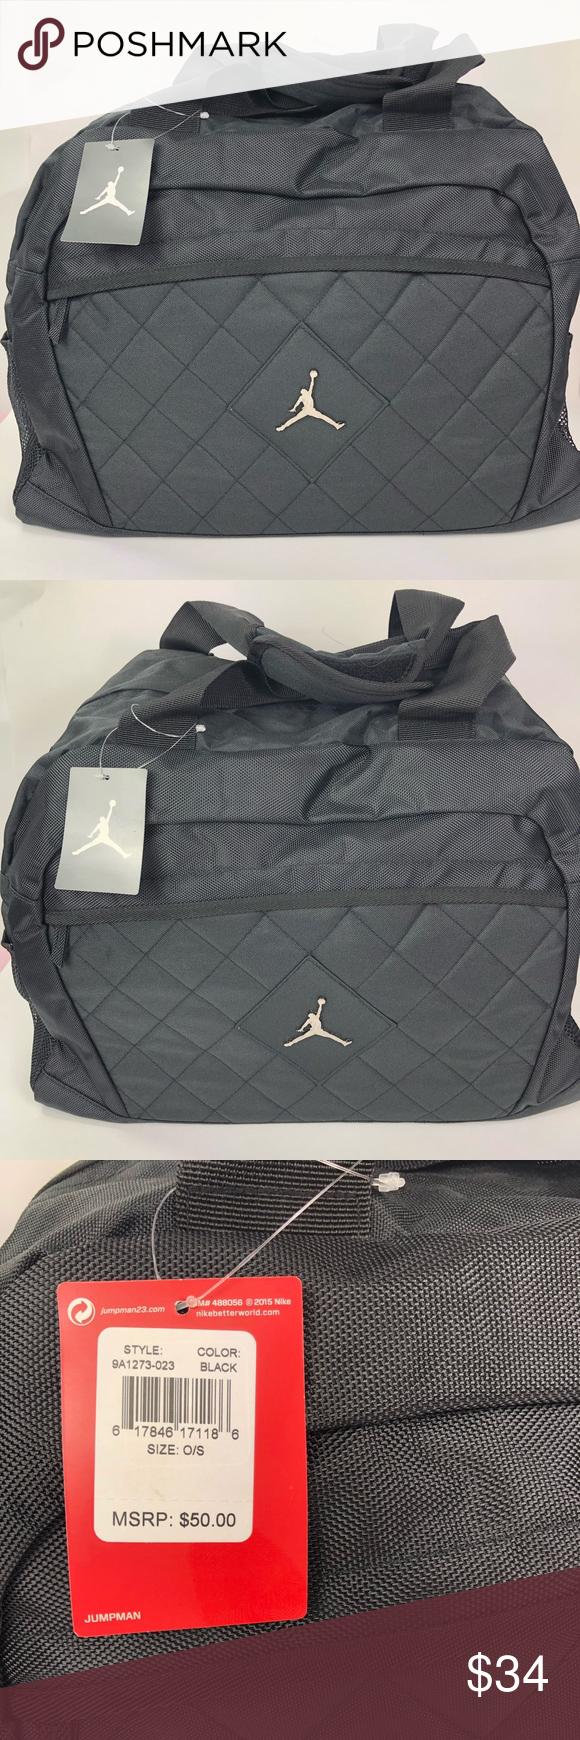 c7db1f70a56861 Michael Jordan Athletic Duffel Gym Bag NWT Brand new condition Tags  attached Original price  50 Adjustable